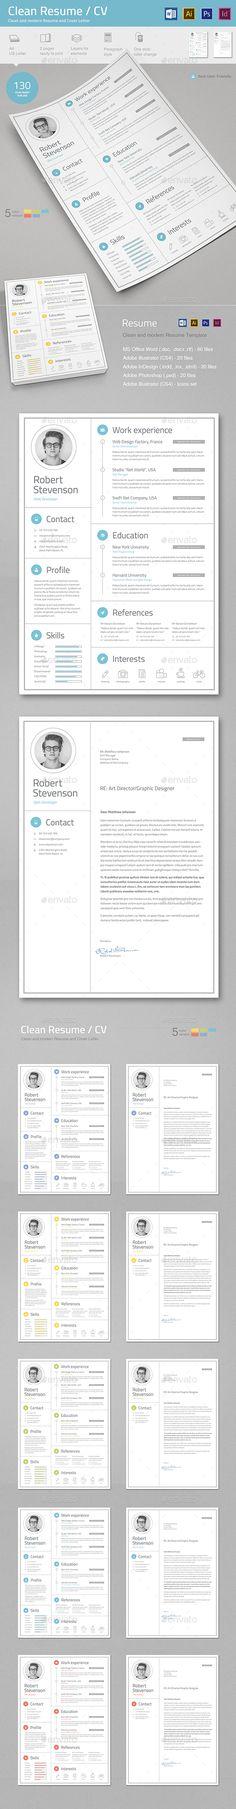 MAC Resume Template u2013 44+ Free Samples, Examples, Format Download - clean resume format